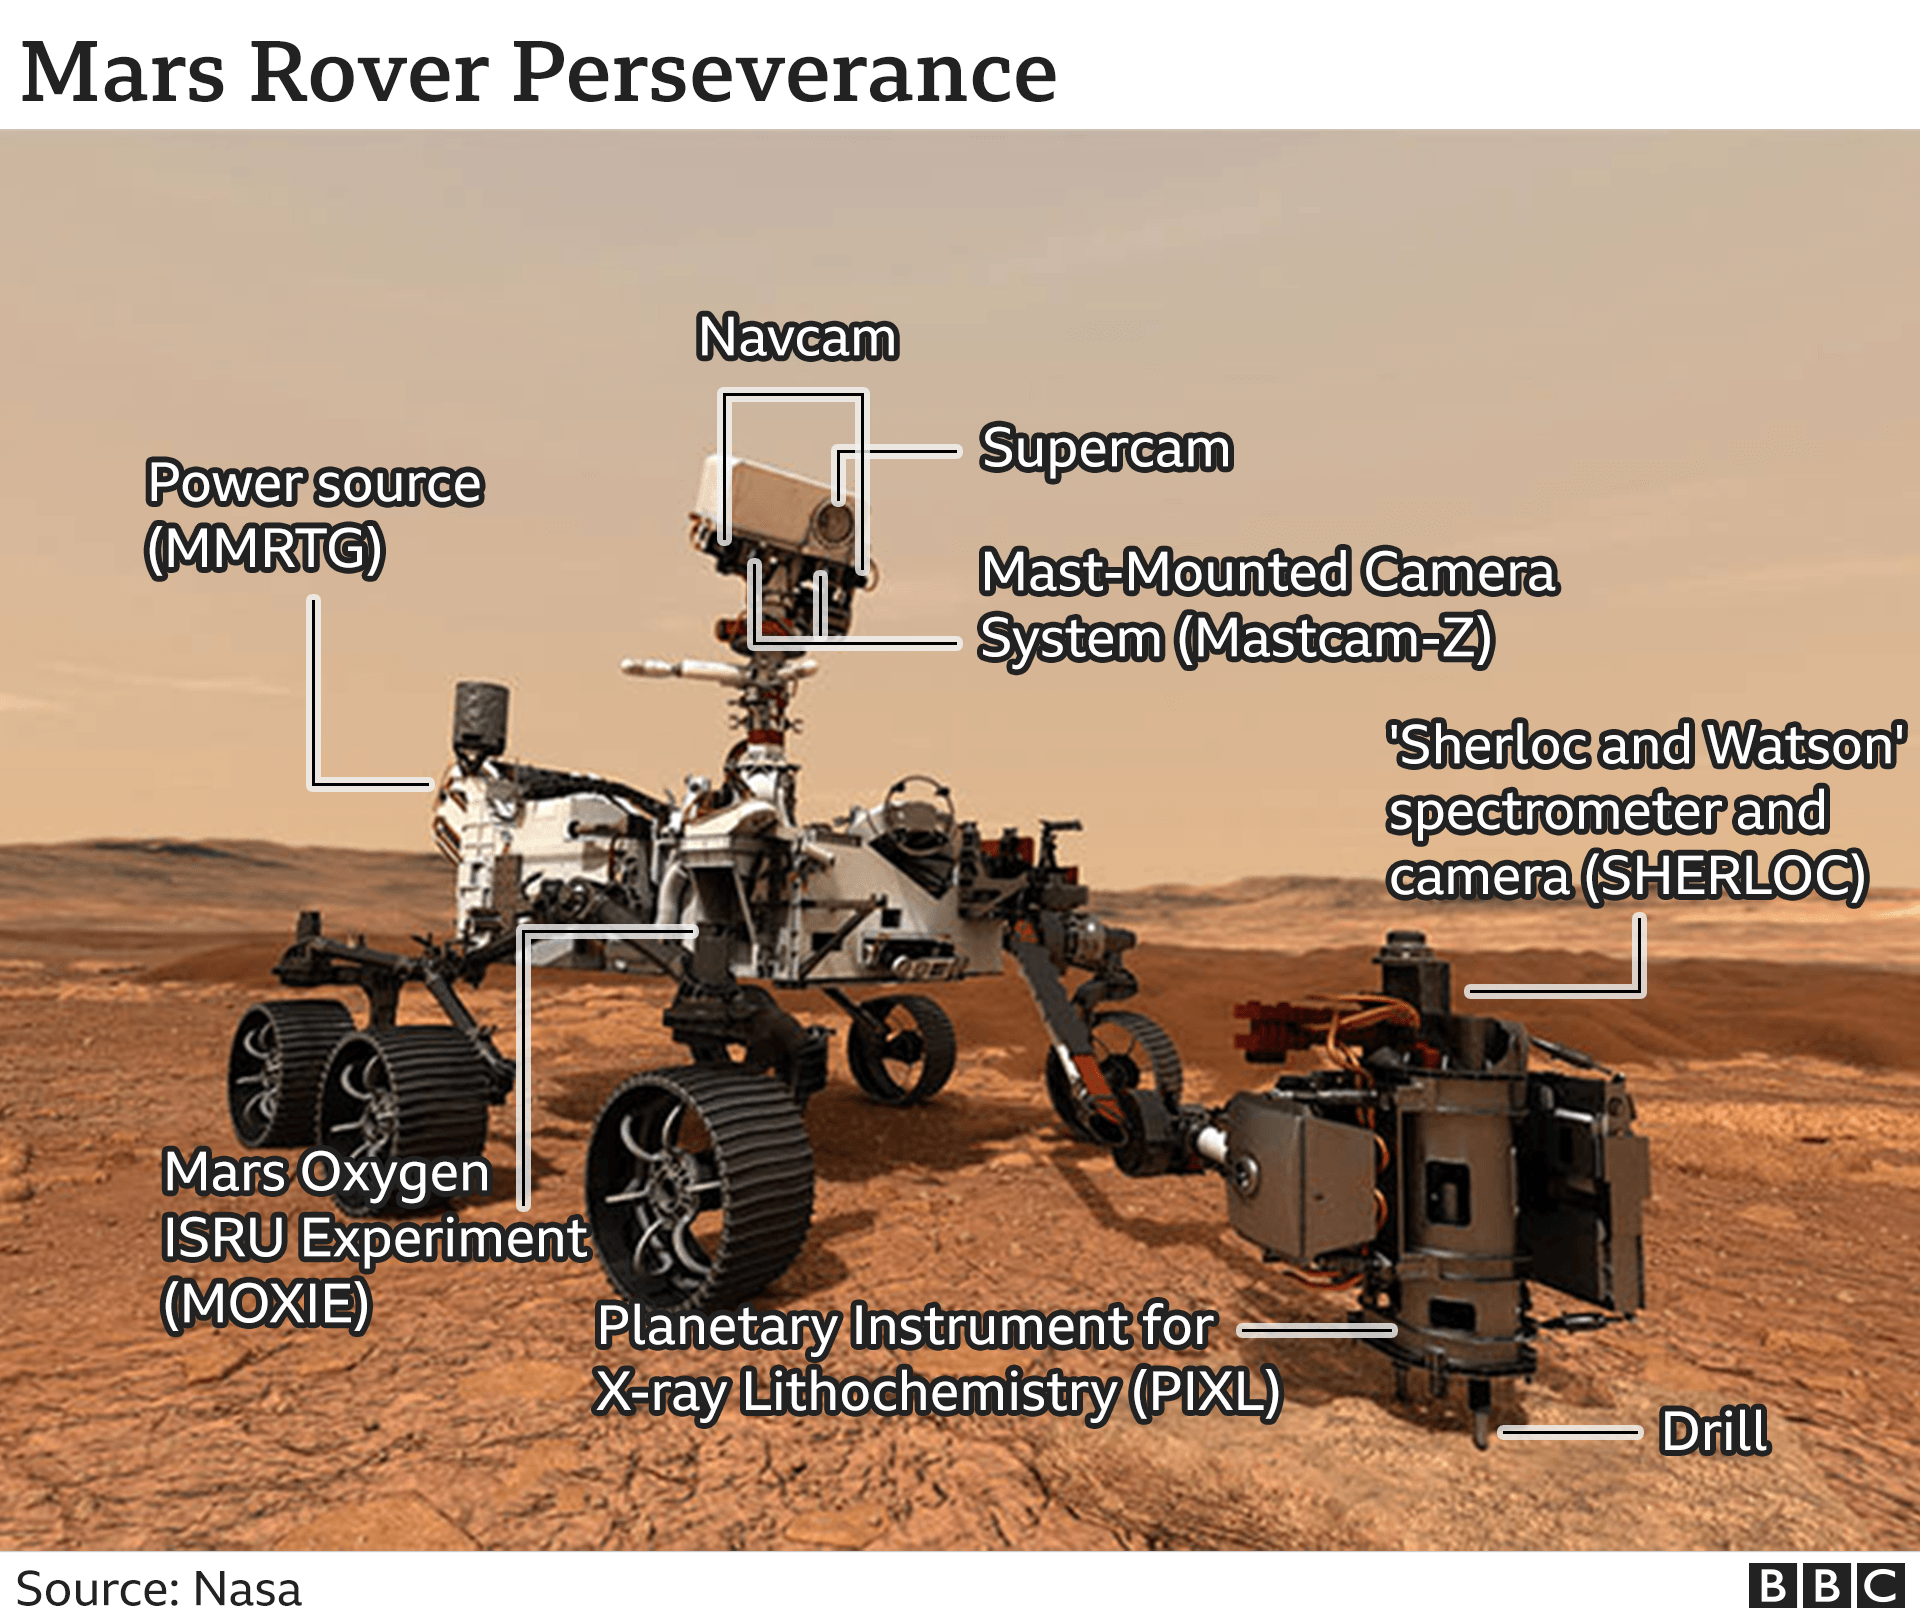 Rover diagram